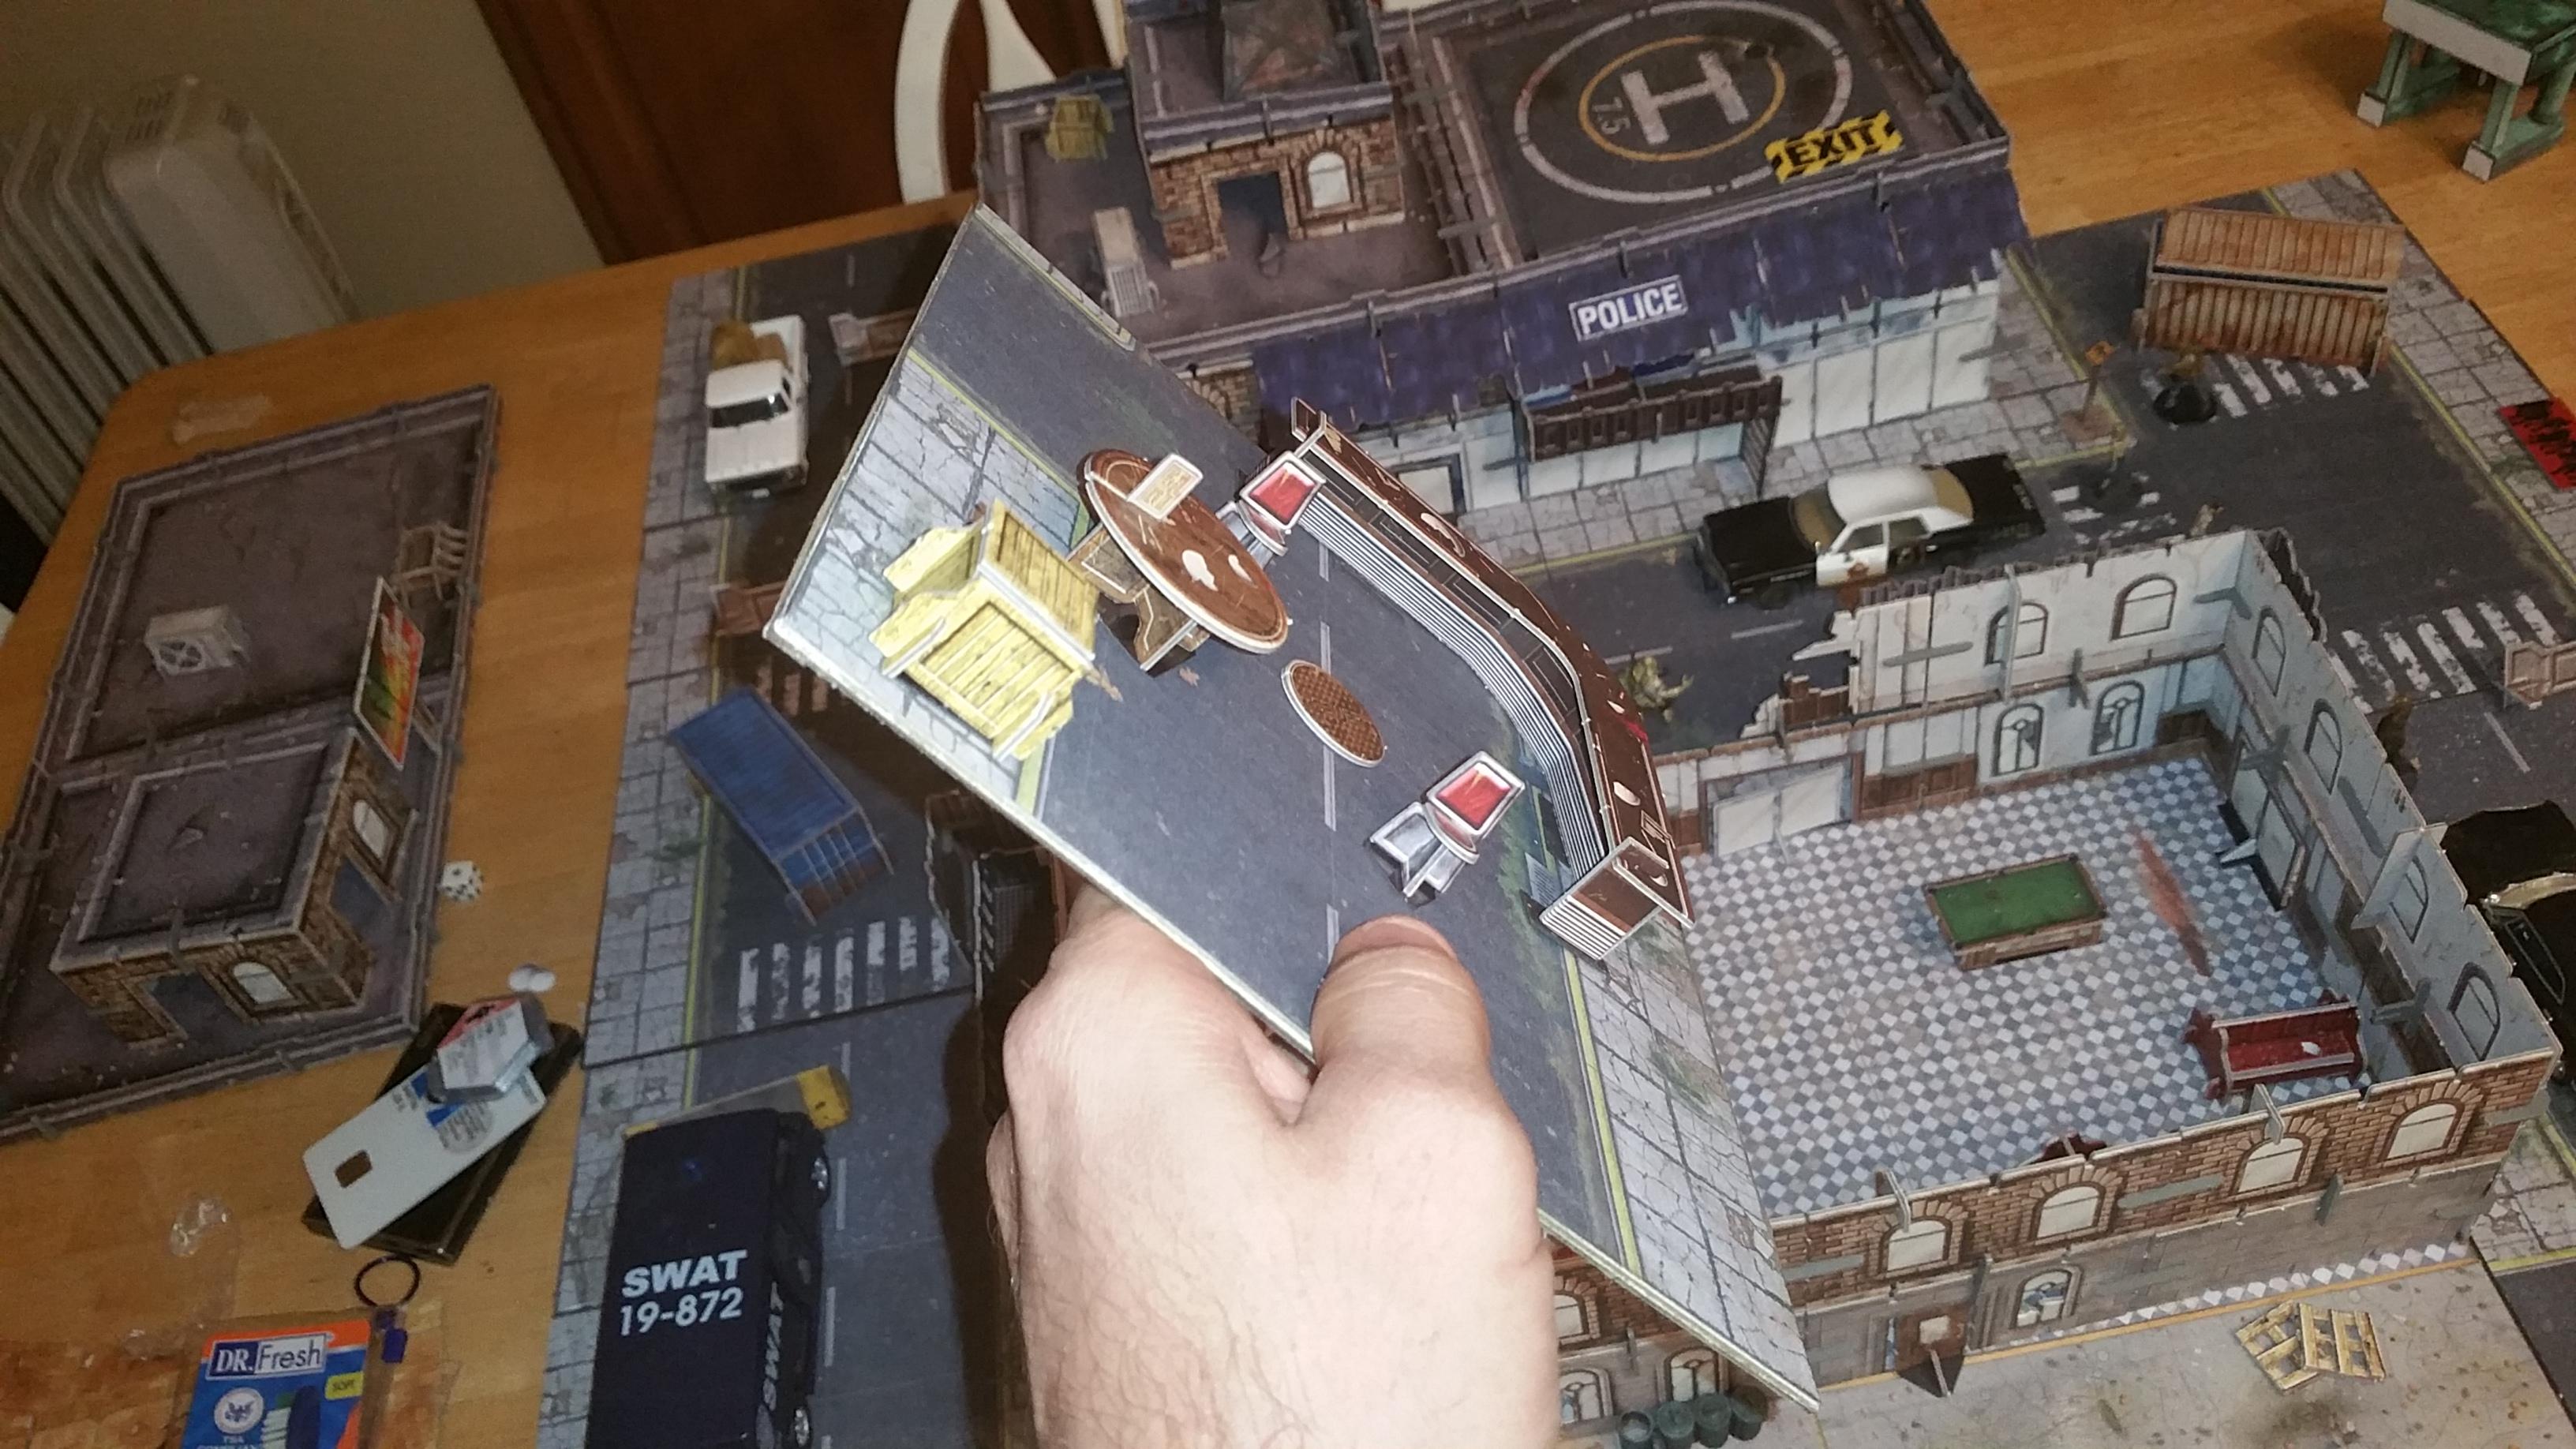 Modular City Tiles - Urban Apocalypse Wargaming